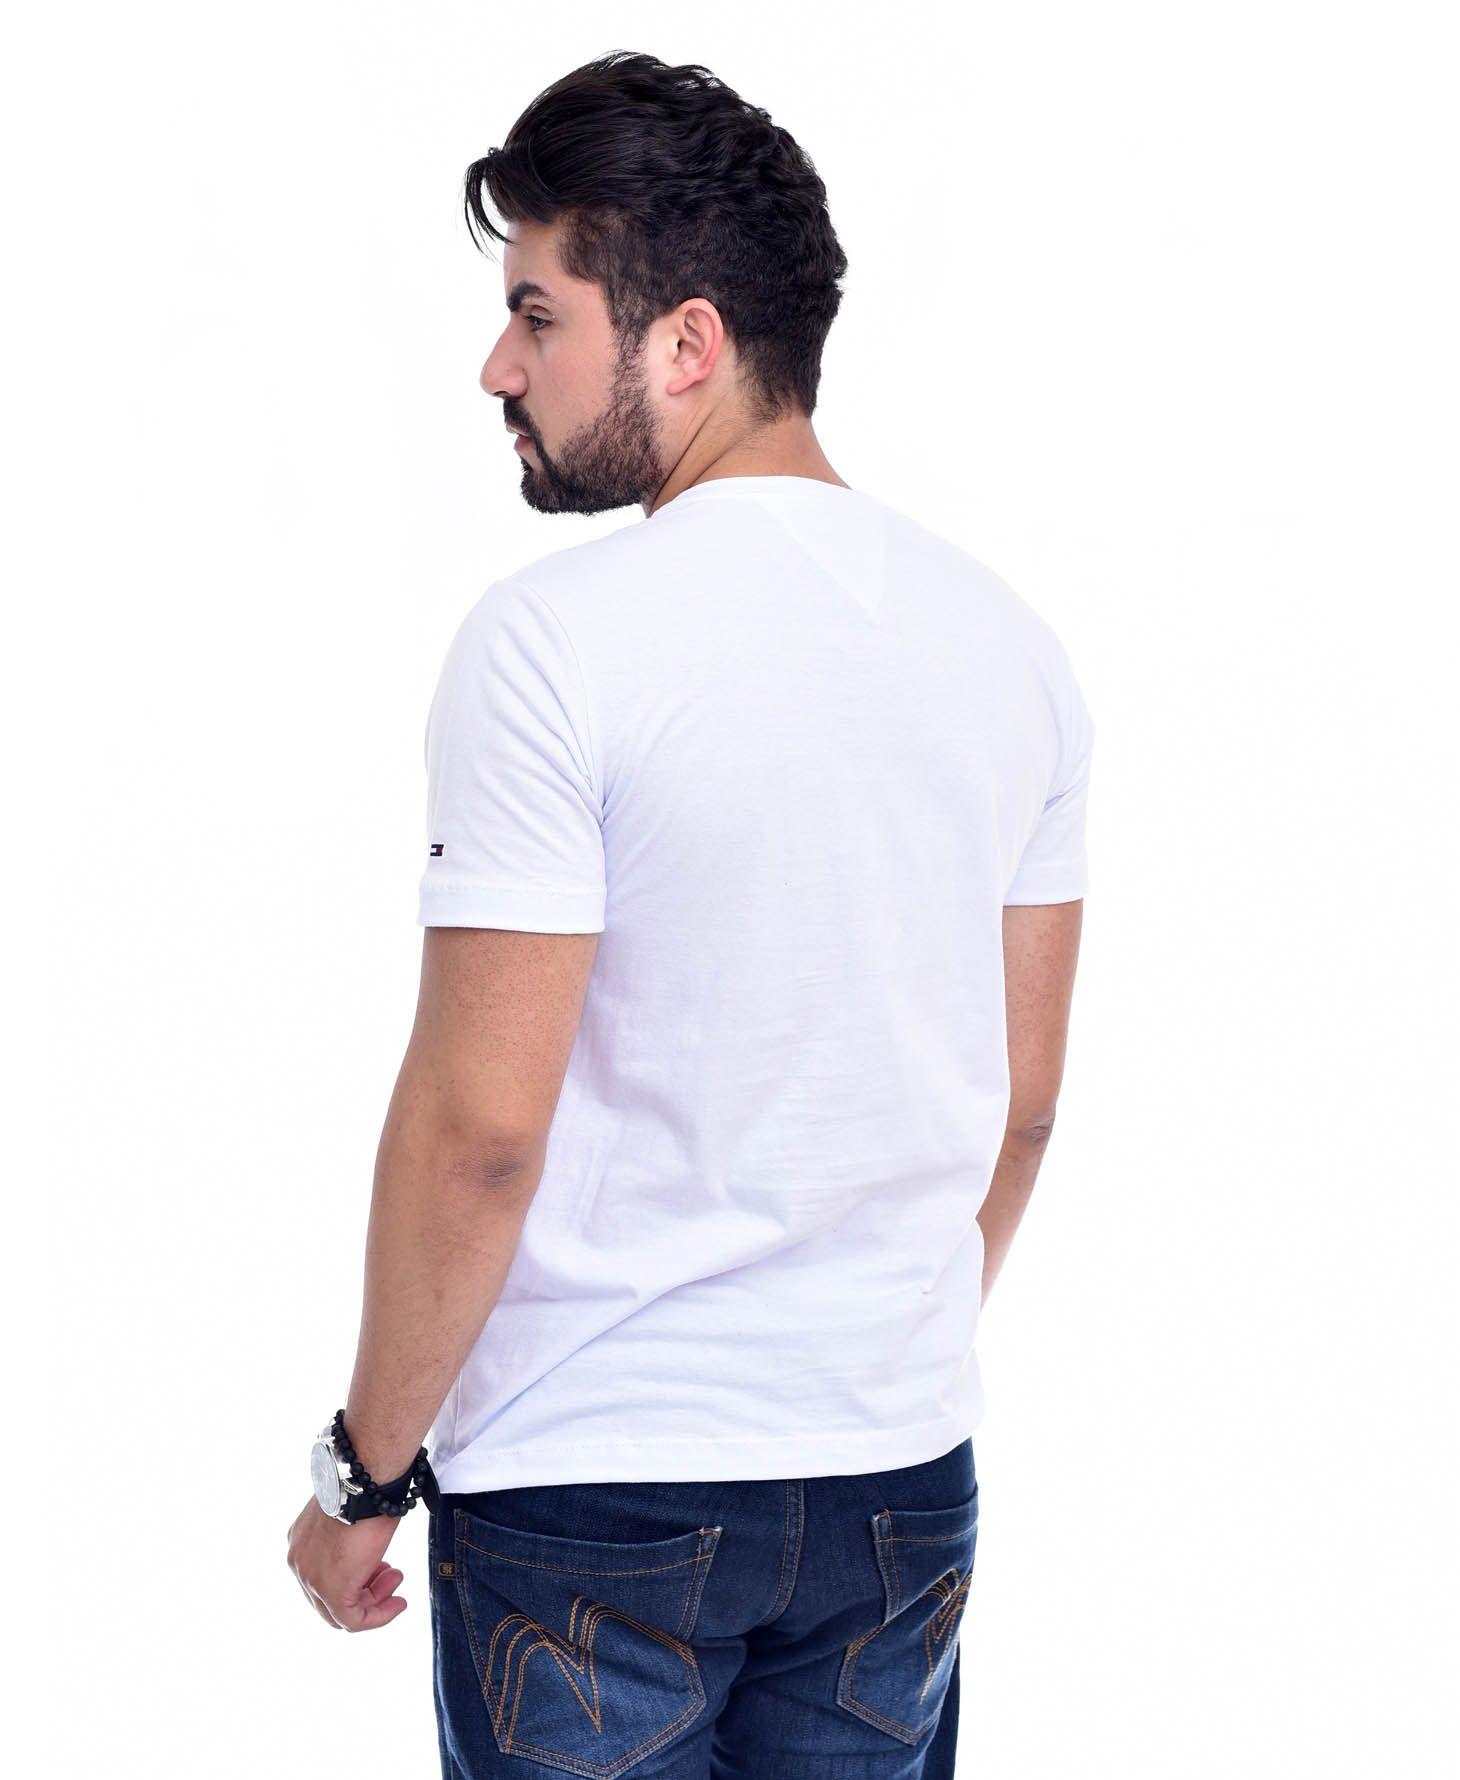 Camiseta Bolso TH Branco Top  - Ca Brasileira